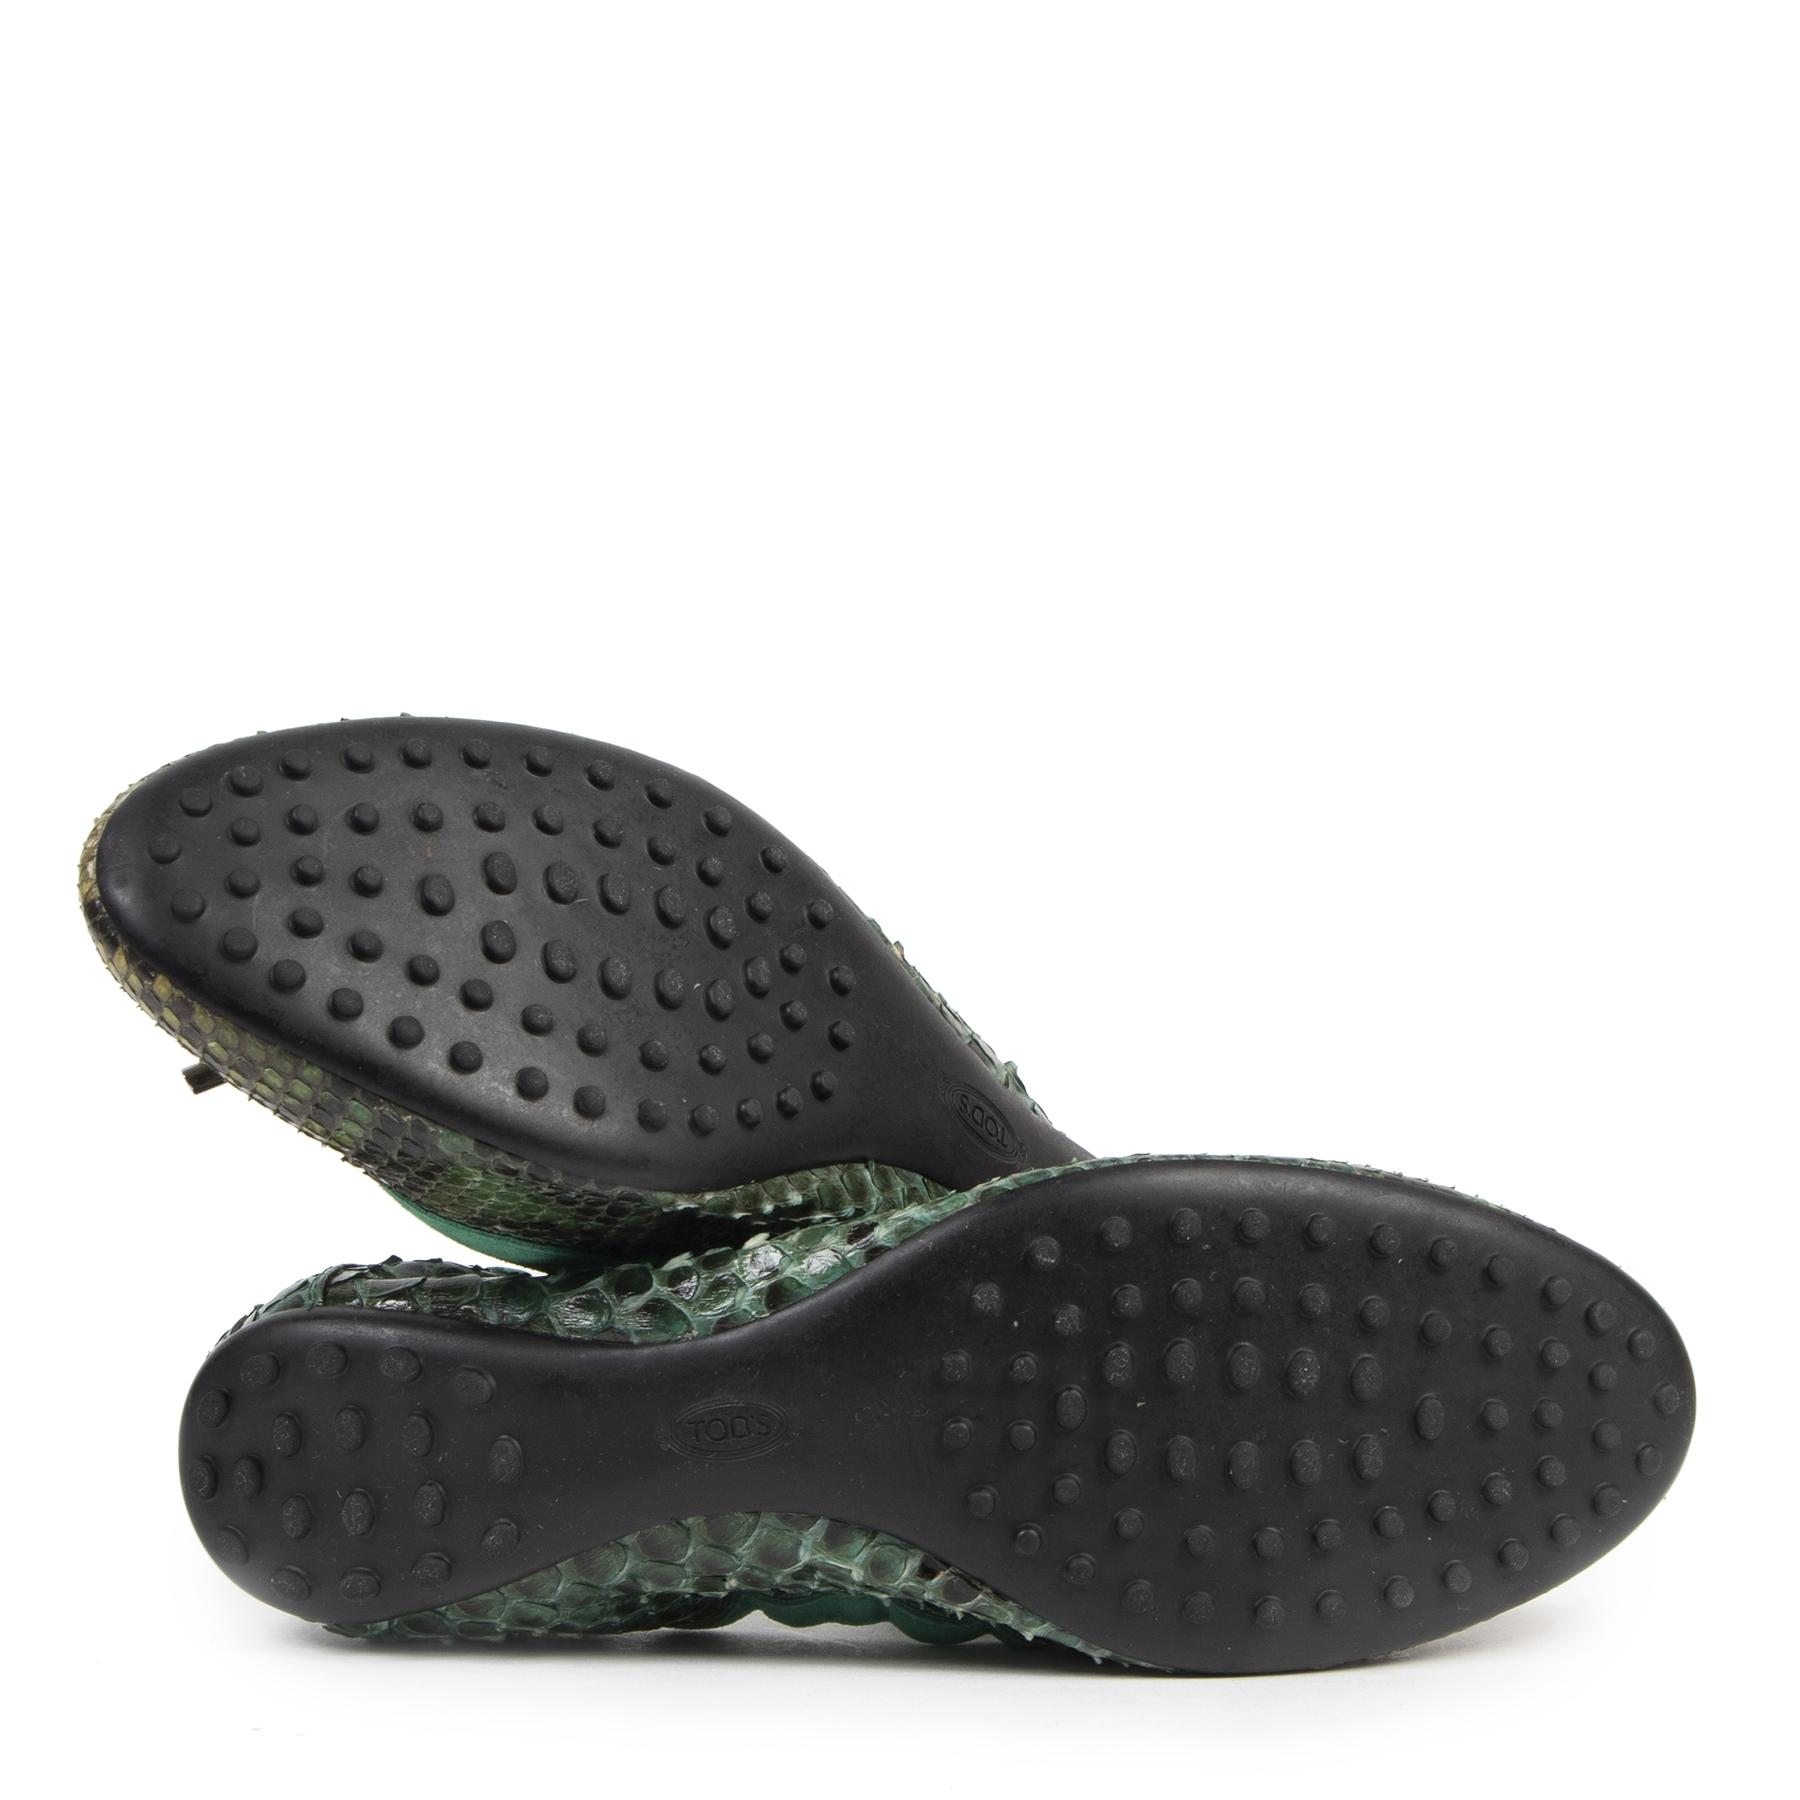 acheter en ligne seconde main Tod's Python Ballet Flats - sze 41